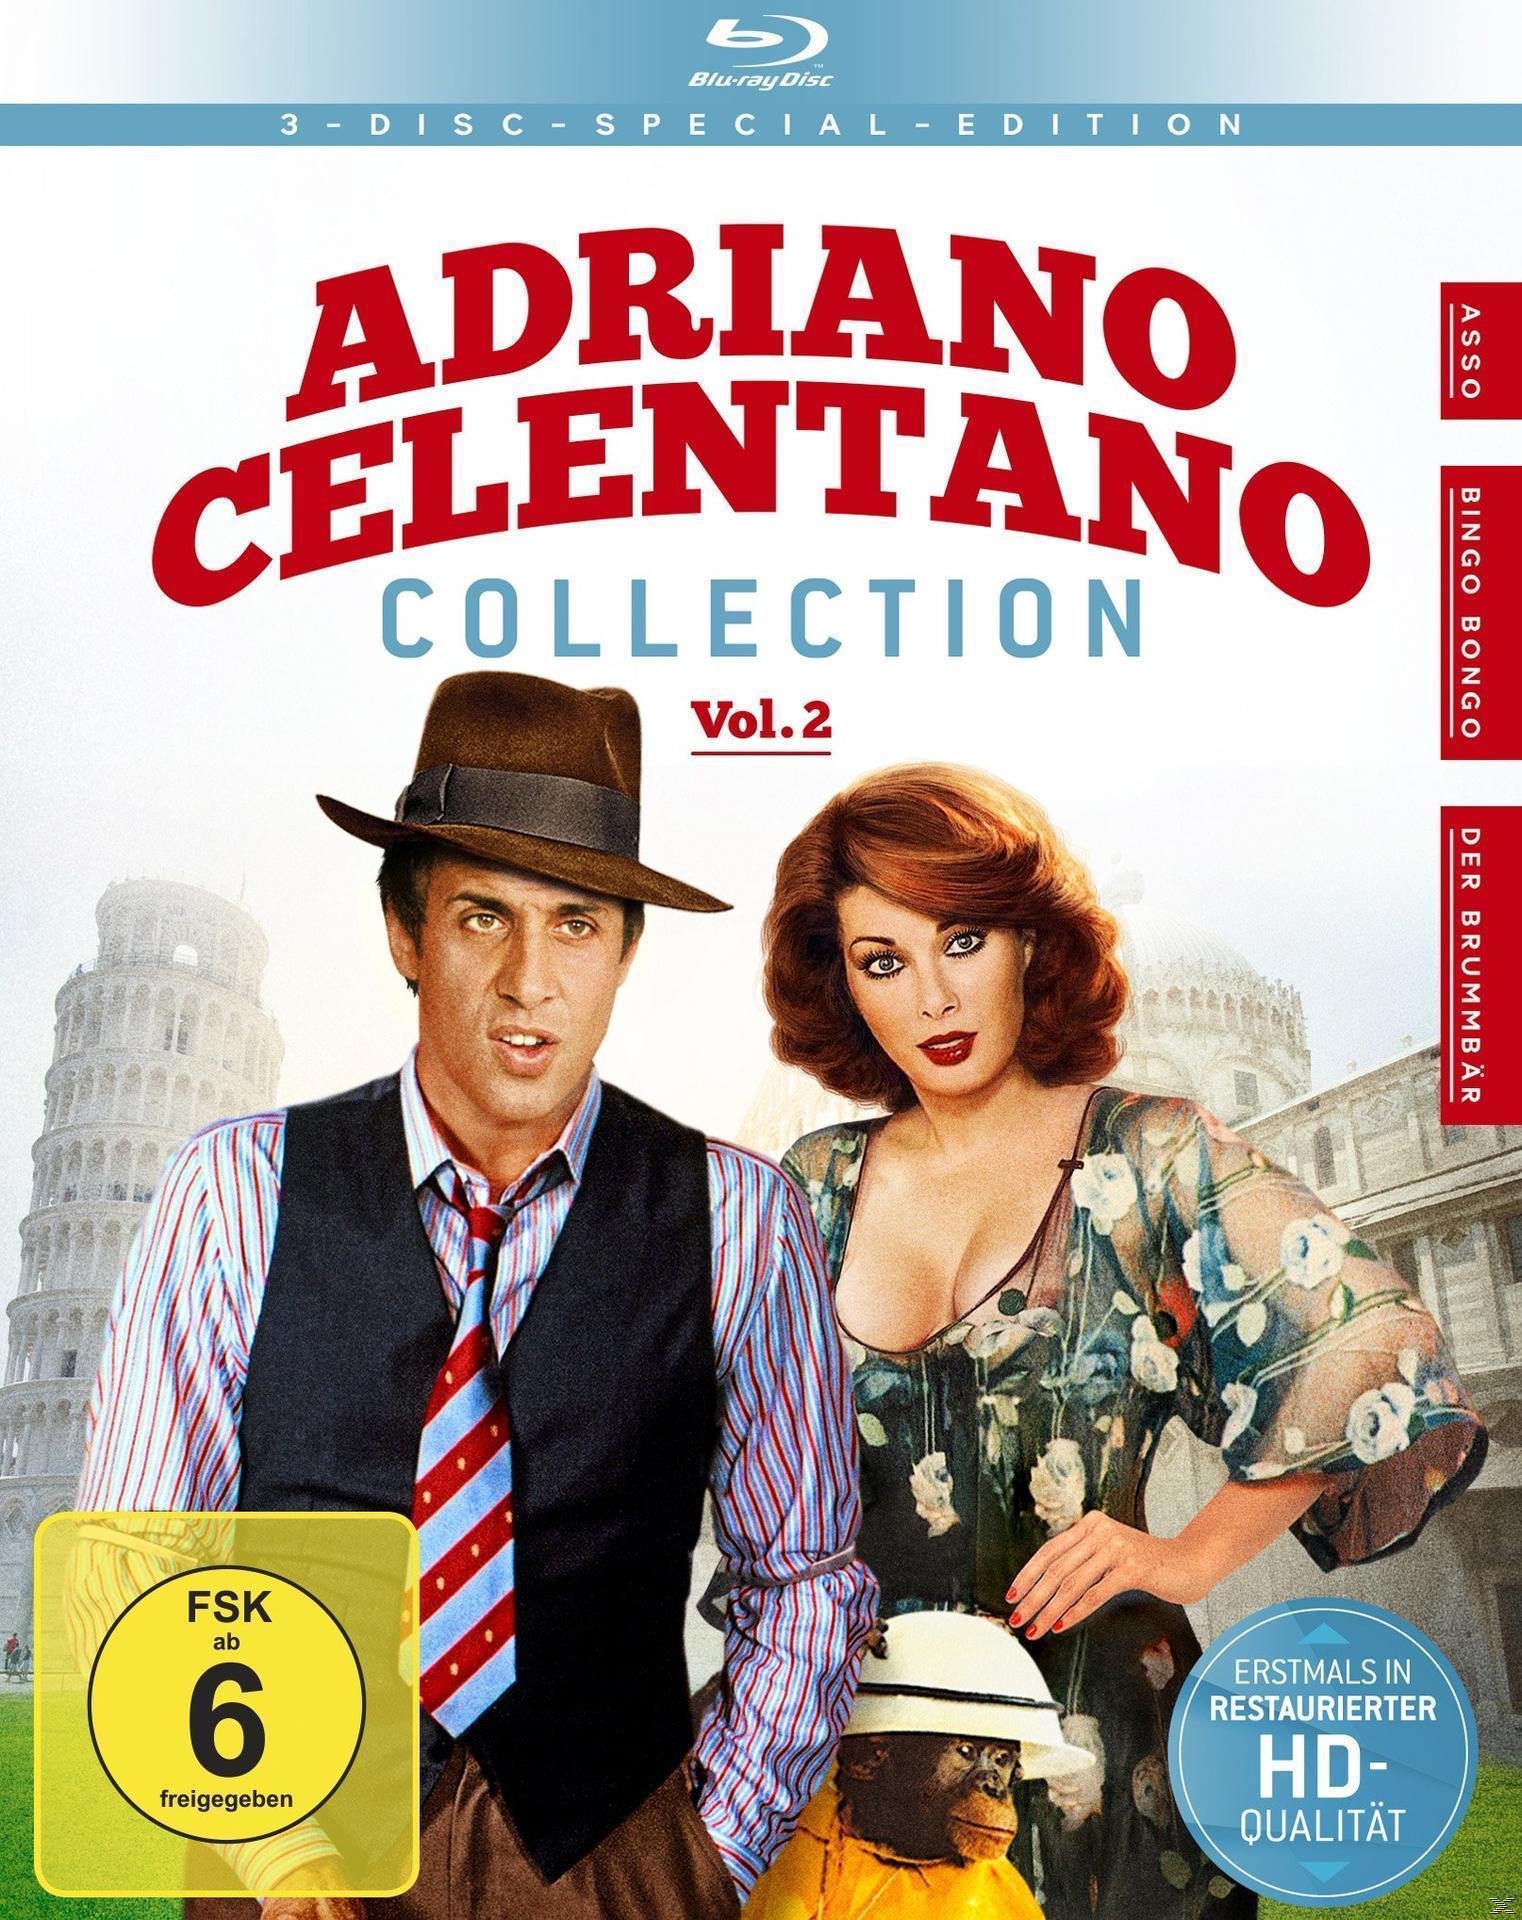 Adriano Celentano - Collection Vol. 2: Asso, Bingo Bongo, Der Brummbär Bluray Box (BLU-RAY) für 28,99 Euro